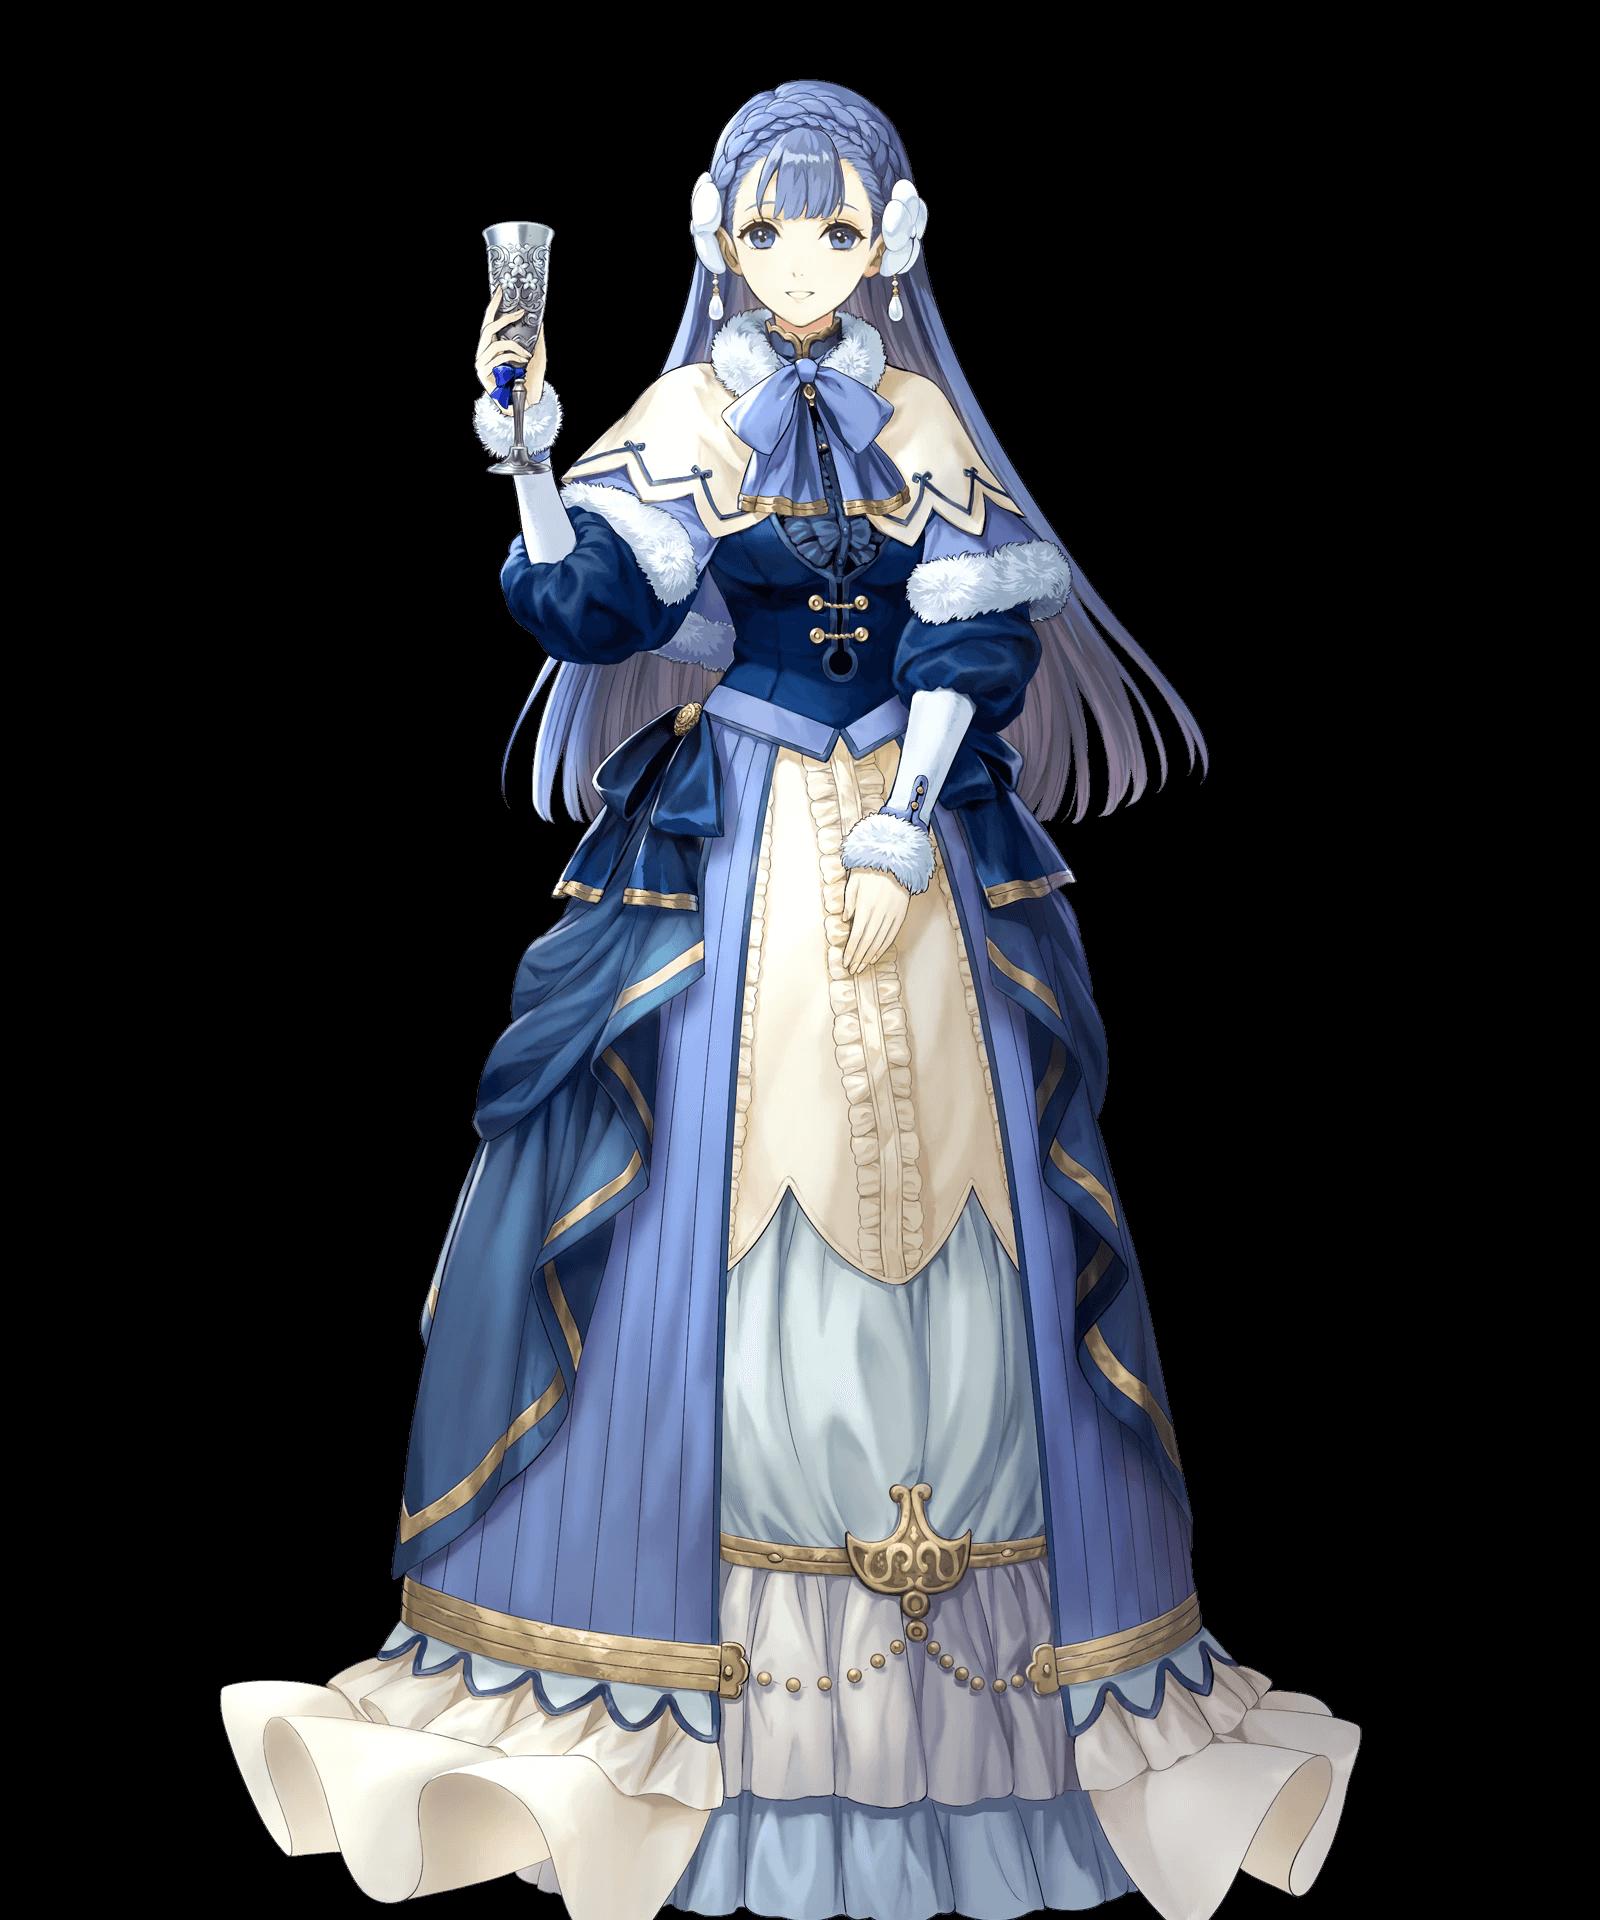 Soiree Rinea | Fire Emblem Heroes Wiki - GamePress